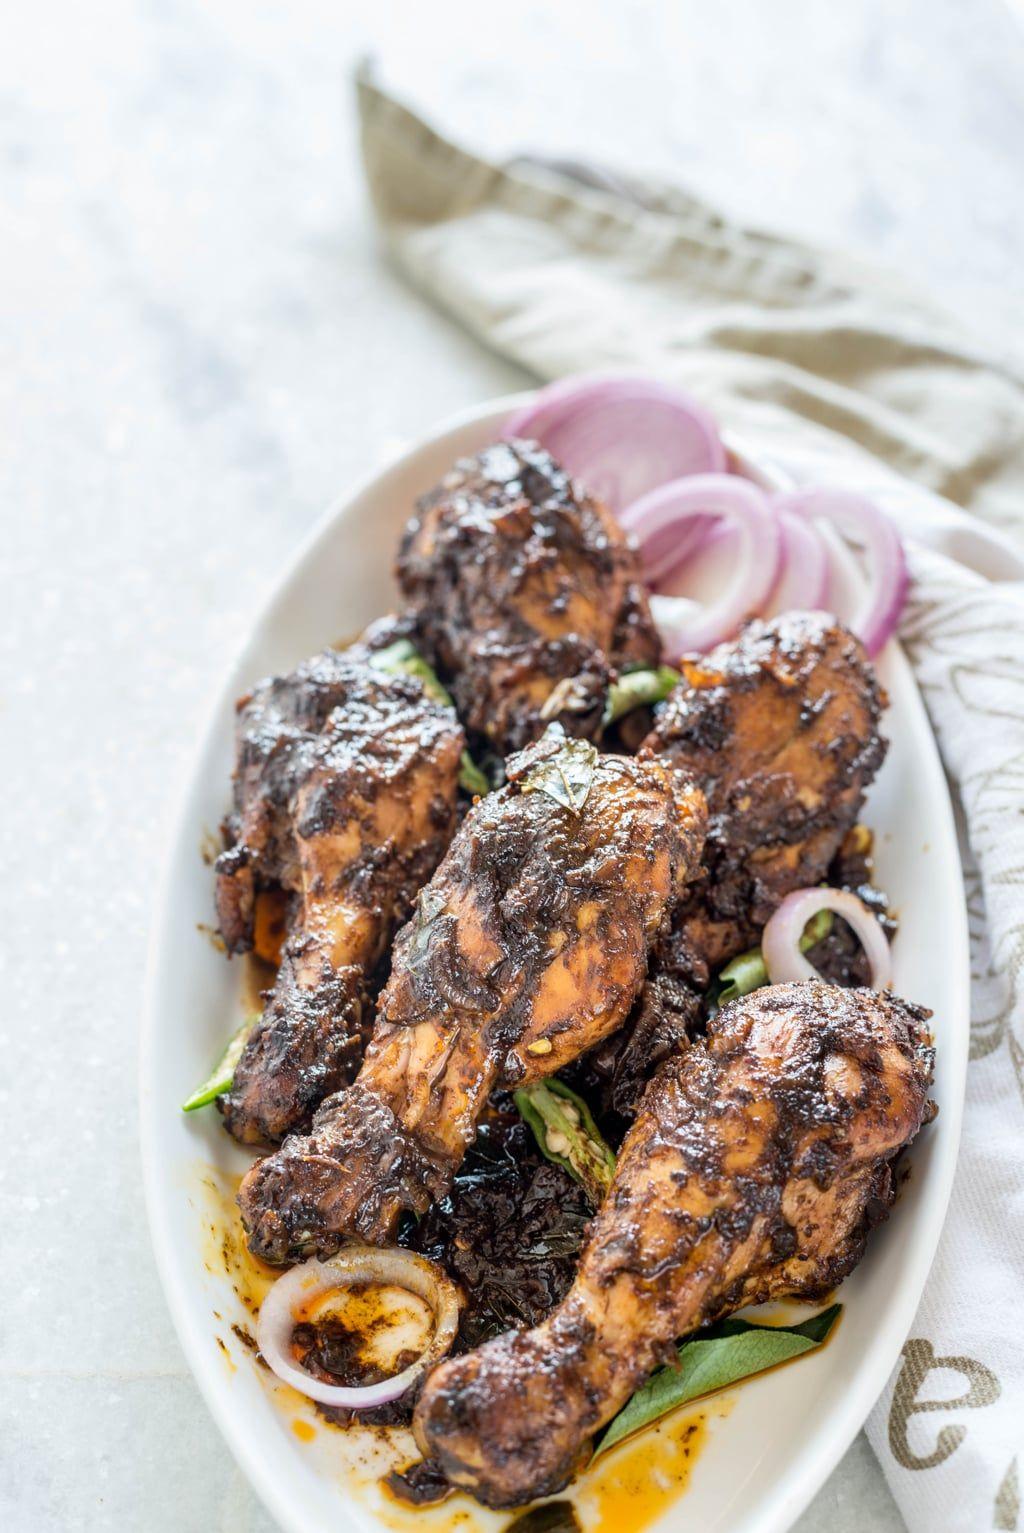 Style Chicken Fry Chicken recipes, Fried chicken